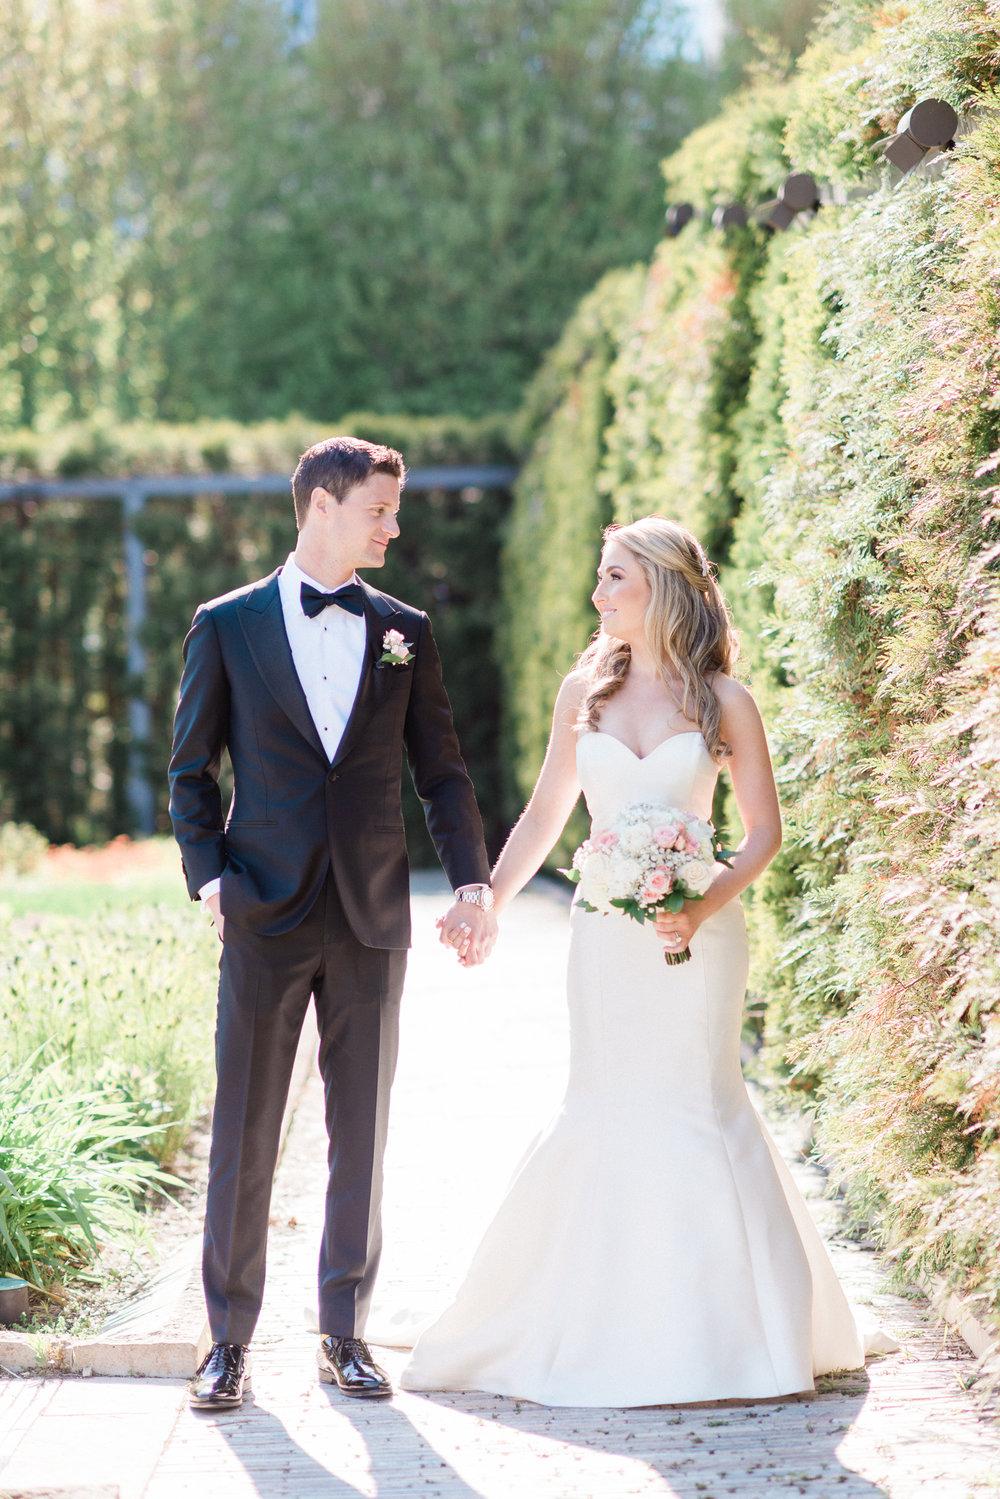 Brittany Bekas - Gallery 1028 Chicago Wedding Photos-19.jpg